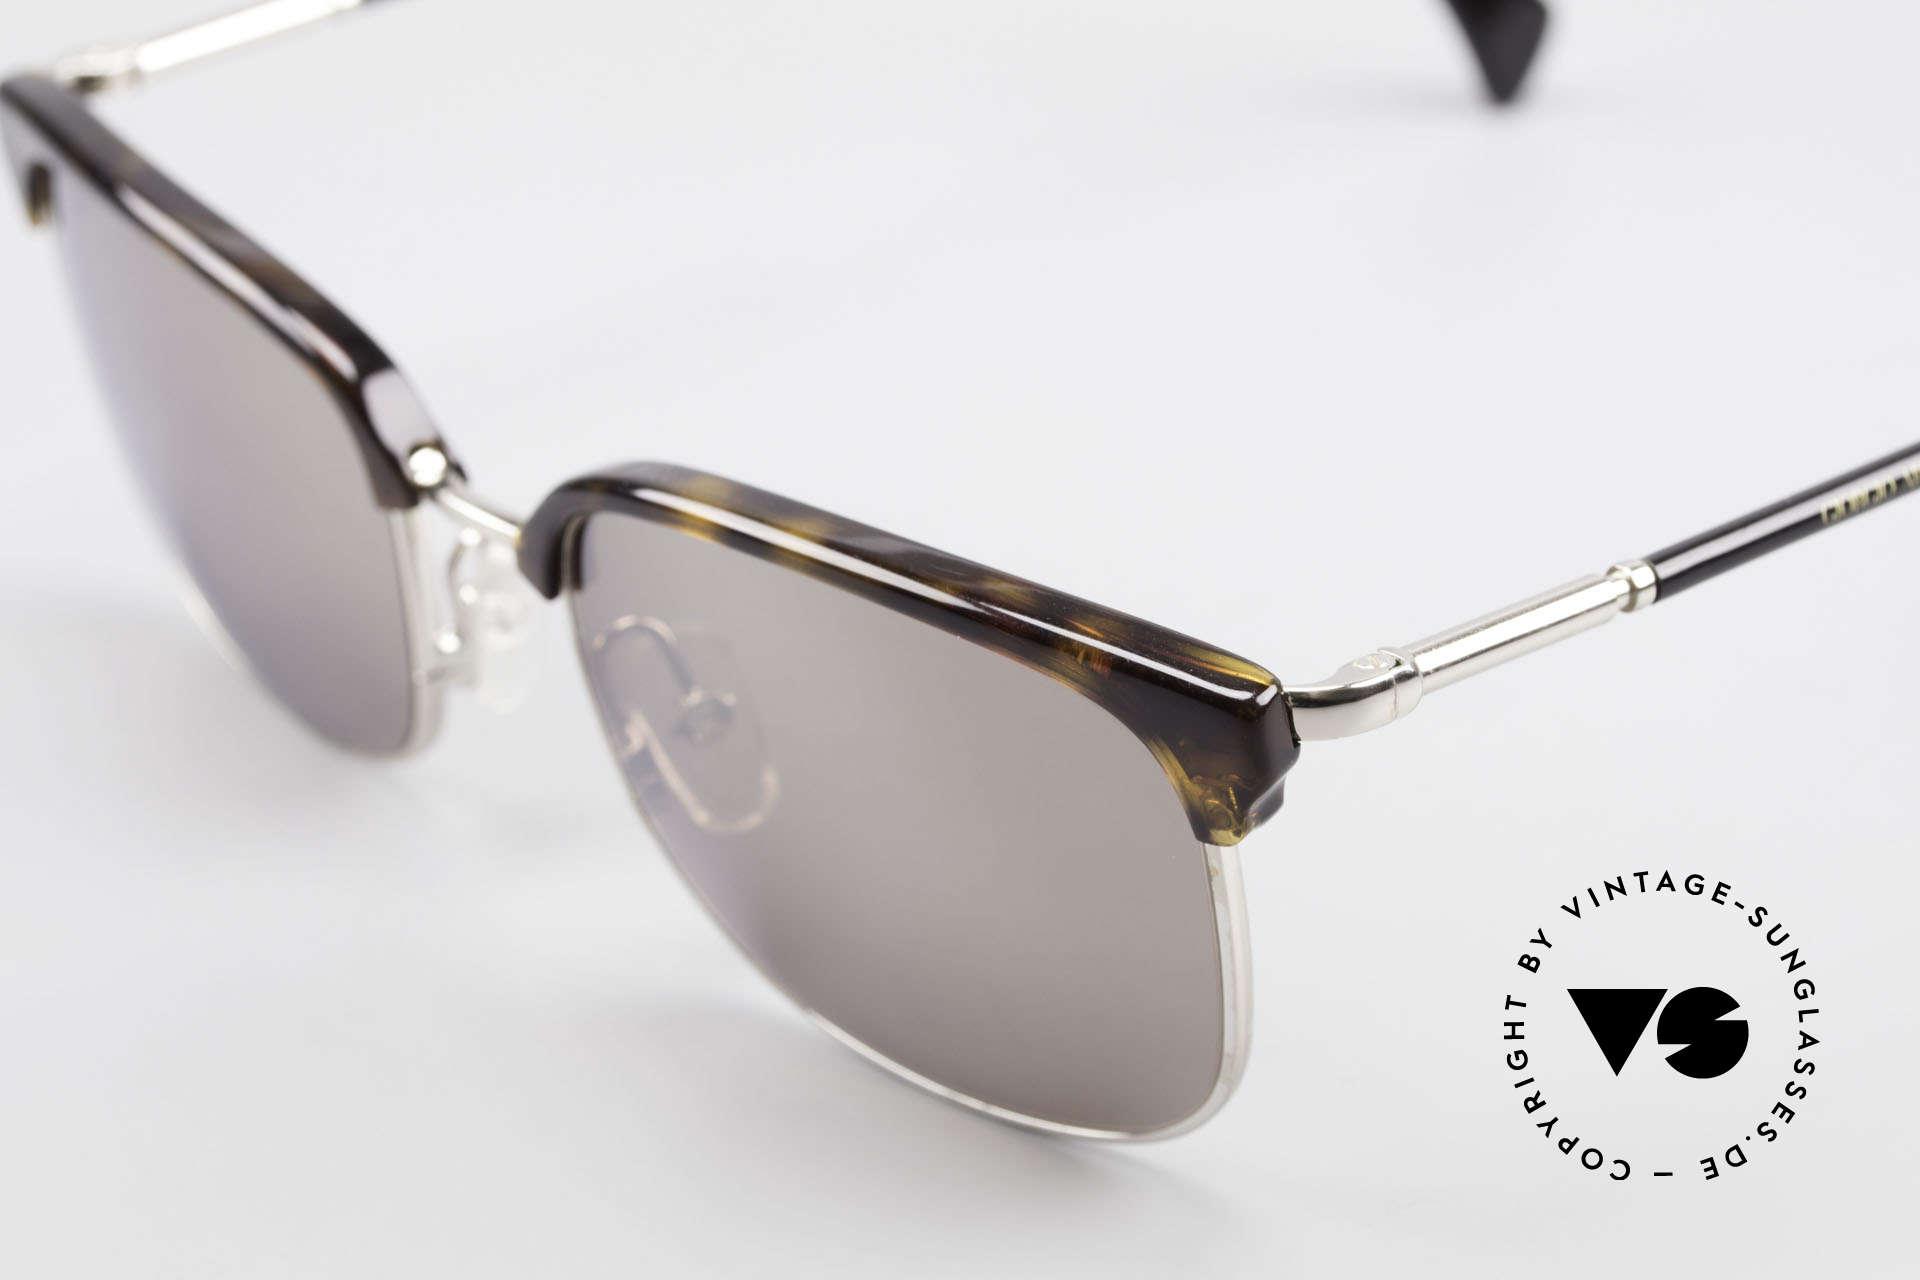 Giorgio Armani 788 Square Panto Sunglasses Men, light mirrored sun lenses (for 100% UV protection), Made for Men